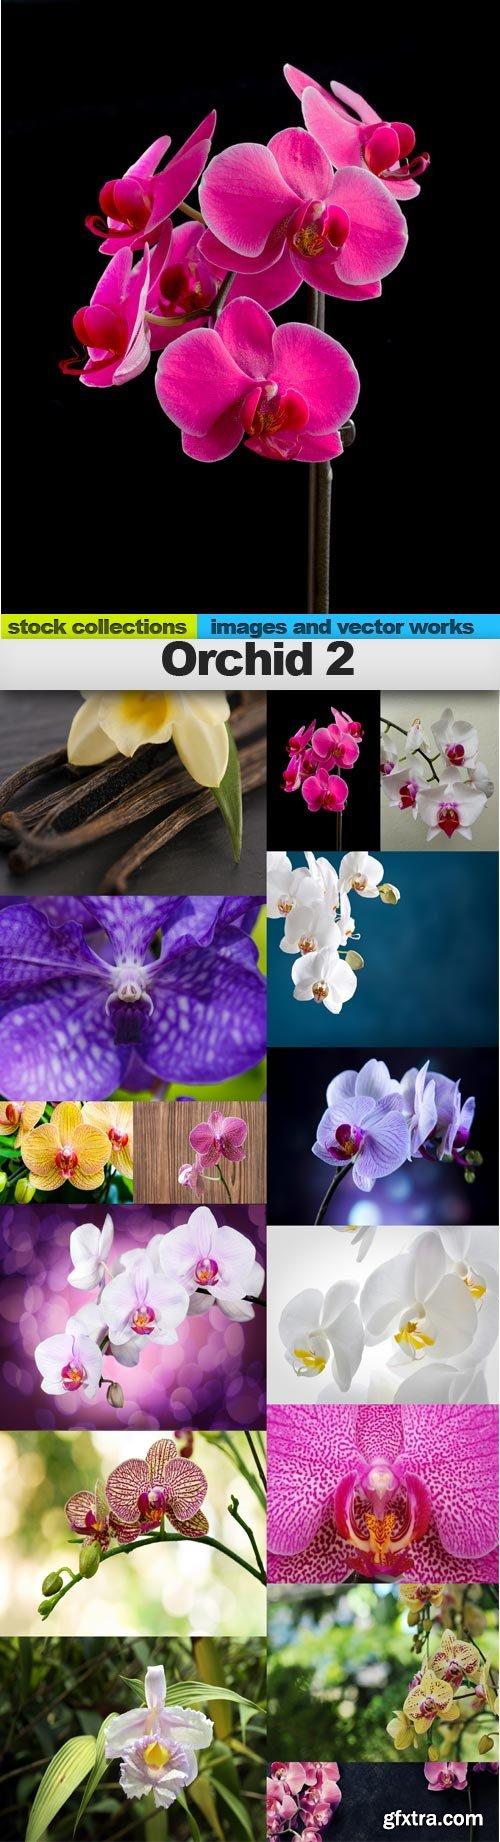 Orchid 2, 15 x UHQ JPEG